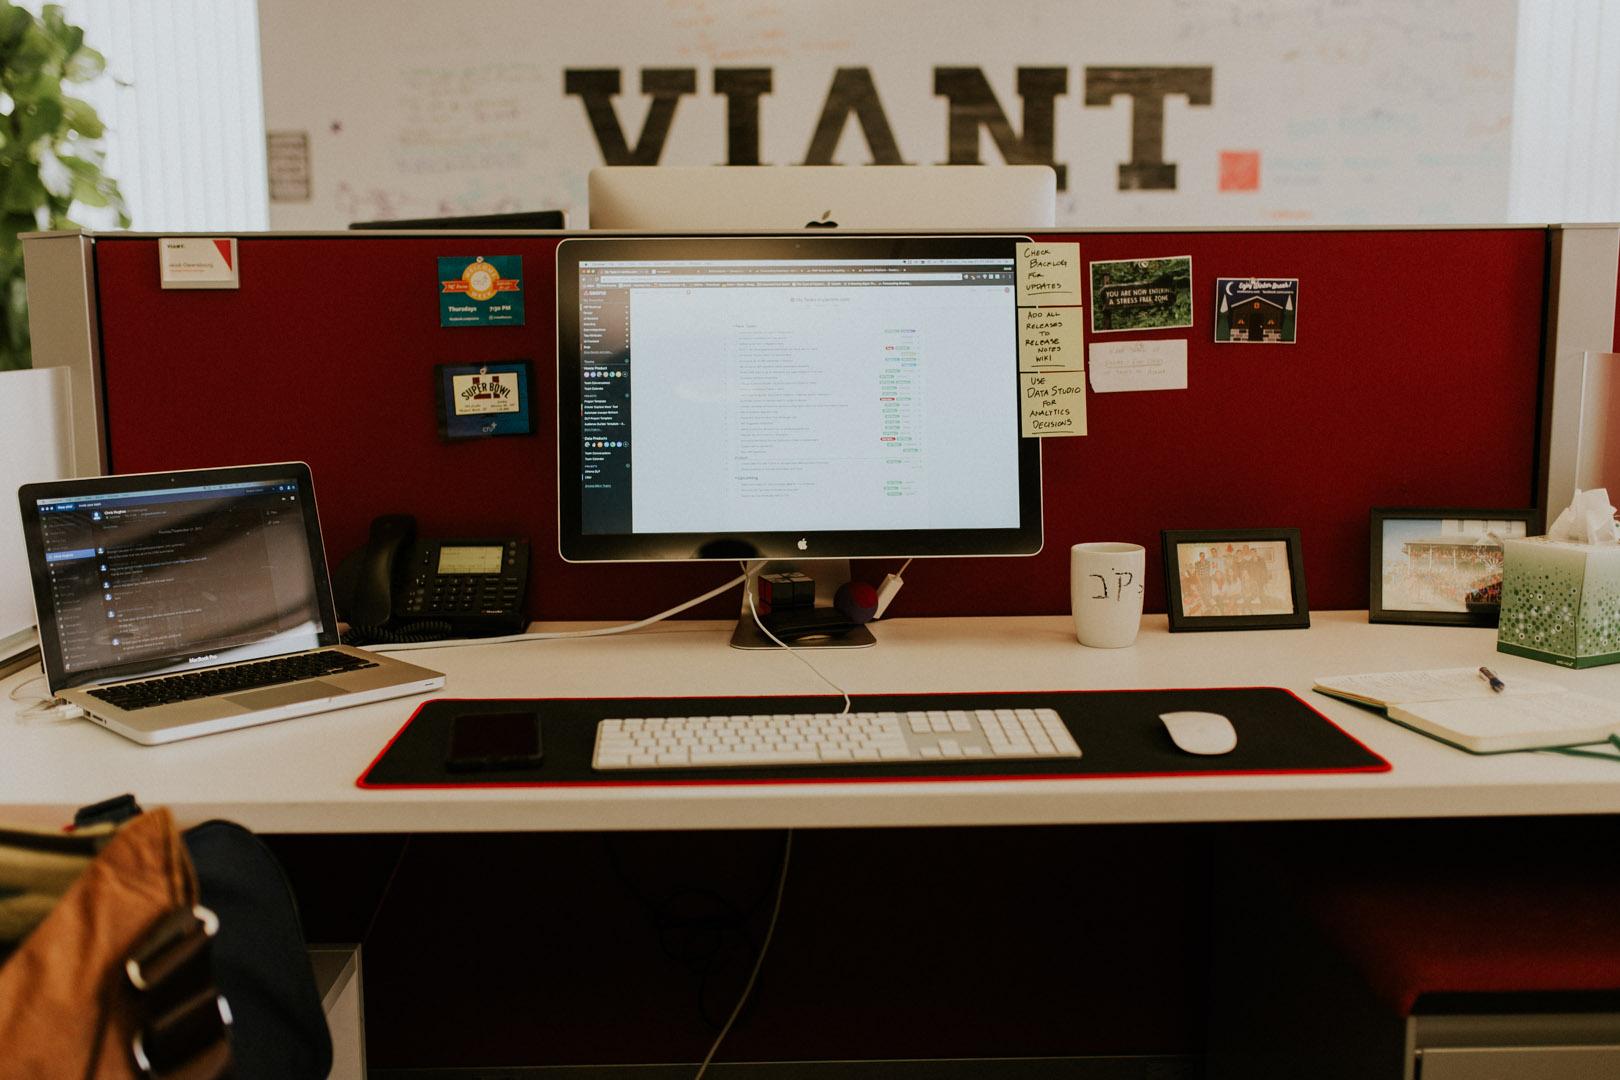 Viant-002.jpg